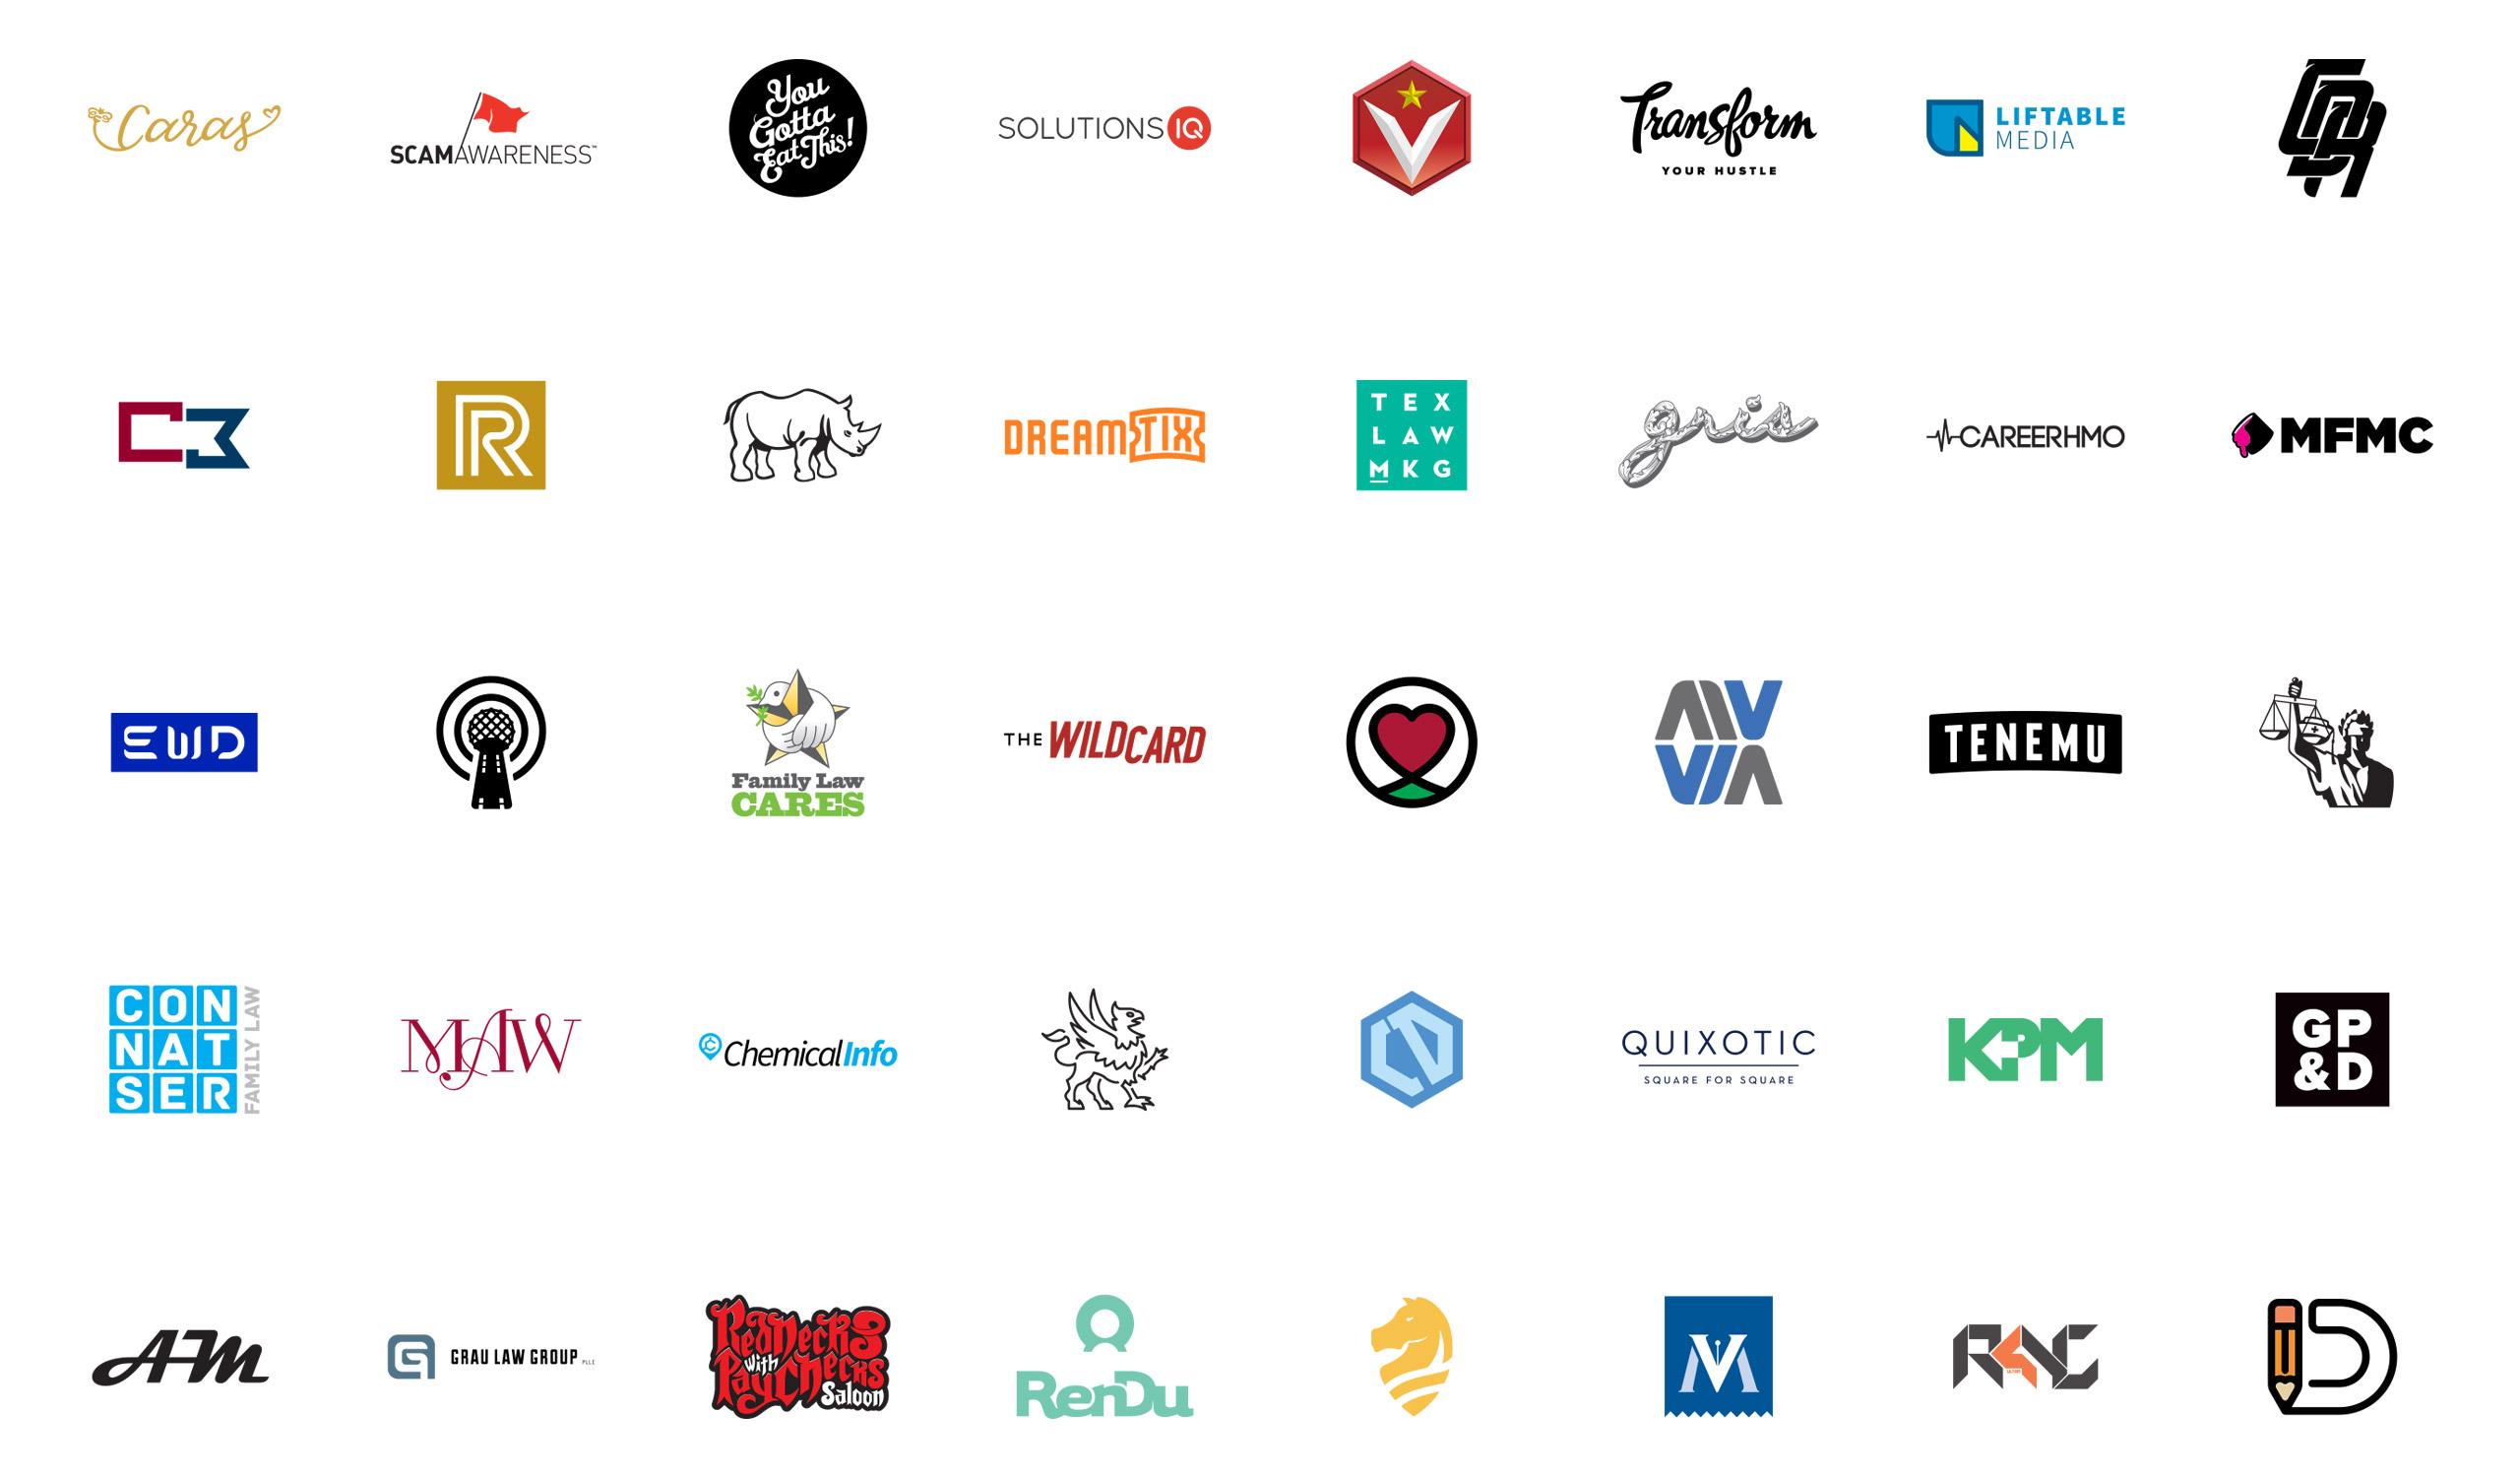 Branding & Logos Design by Duane Smith